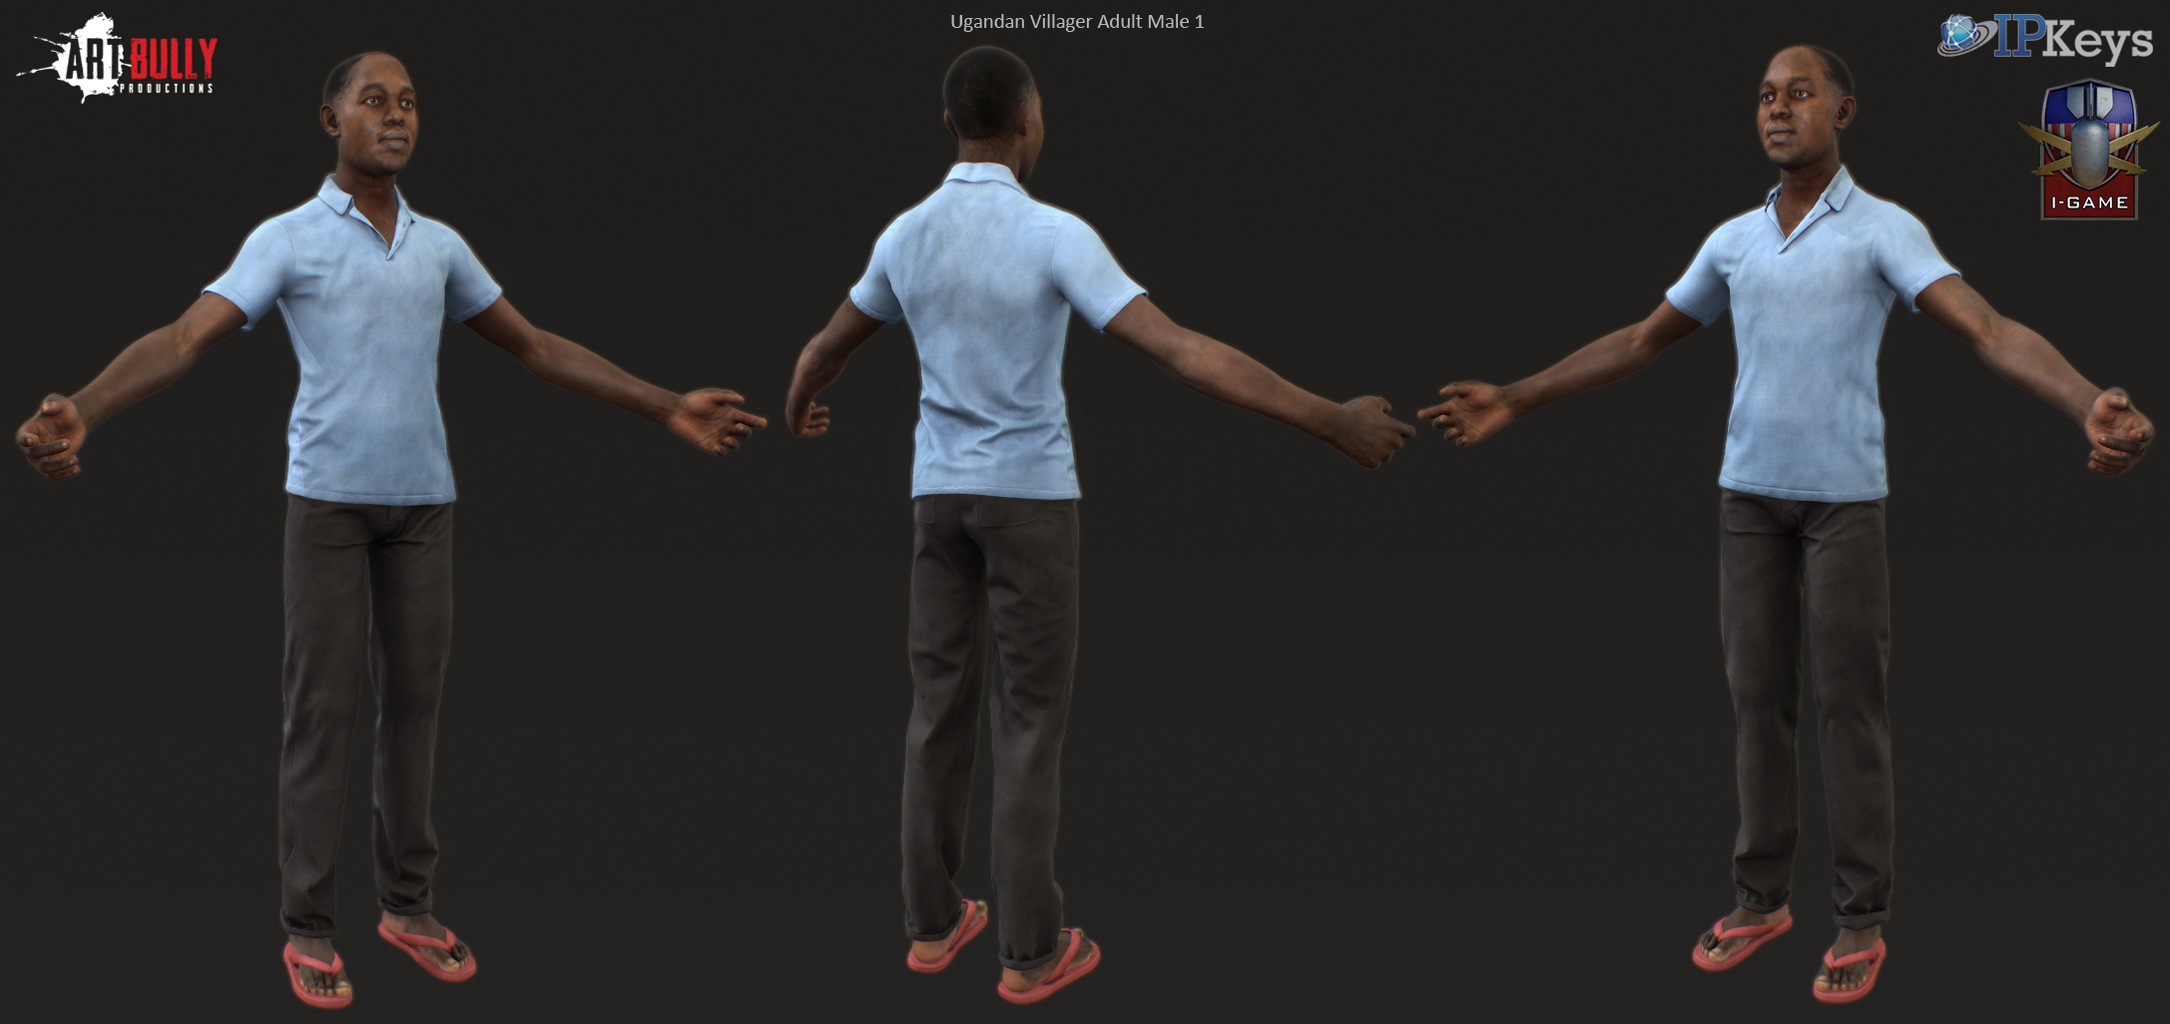 Ugandan_Villager_Adult_Male1.jpg